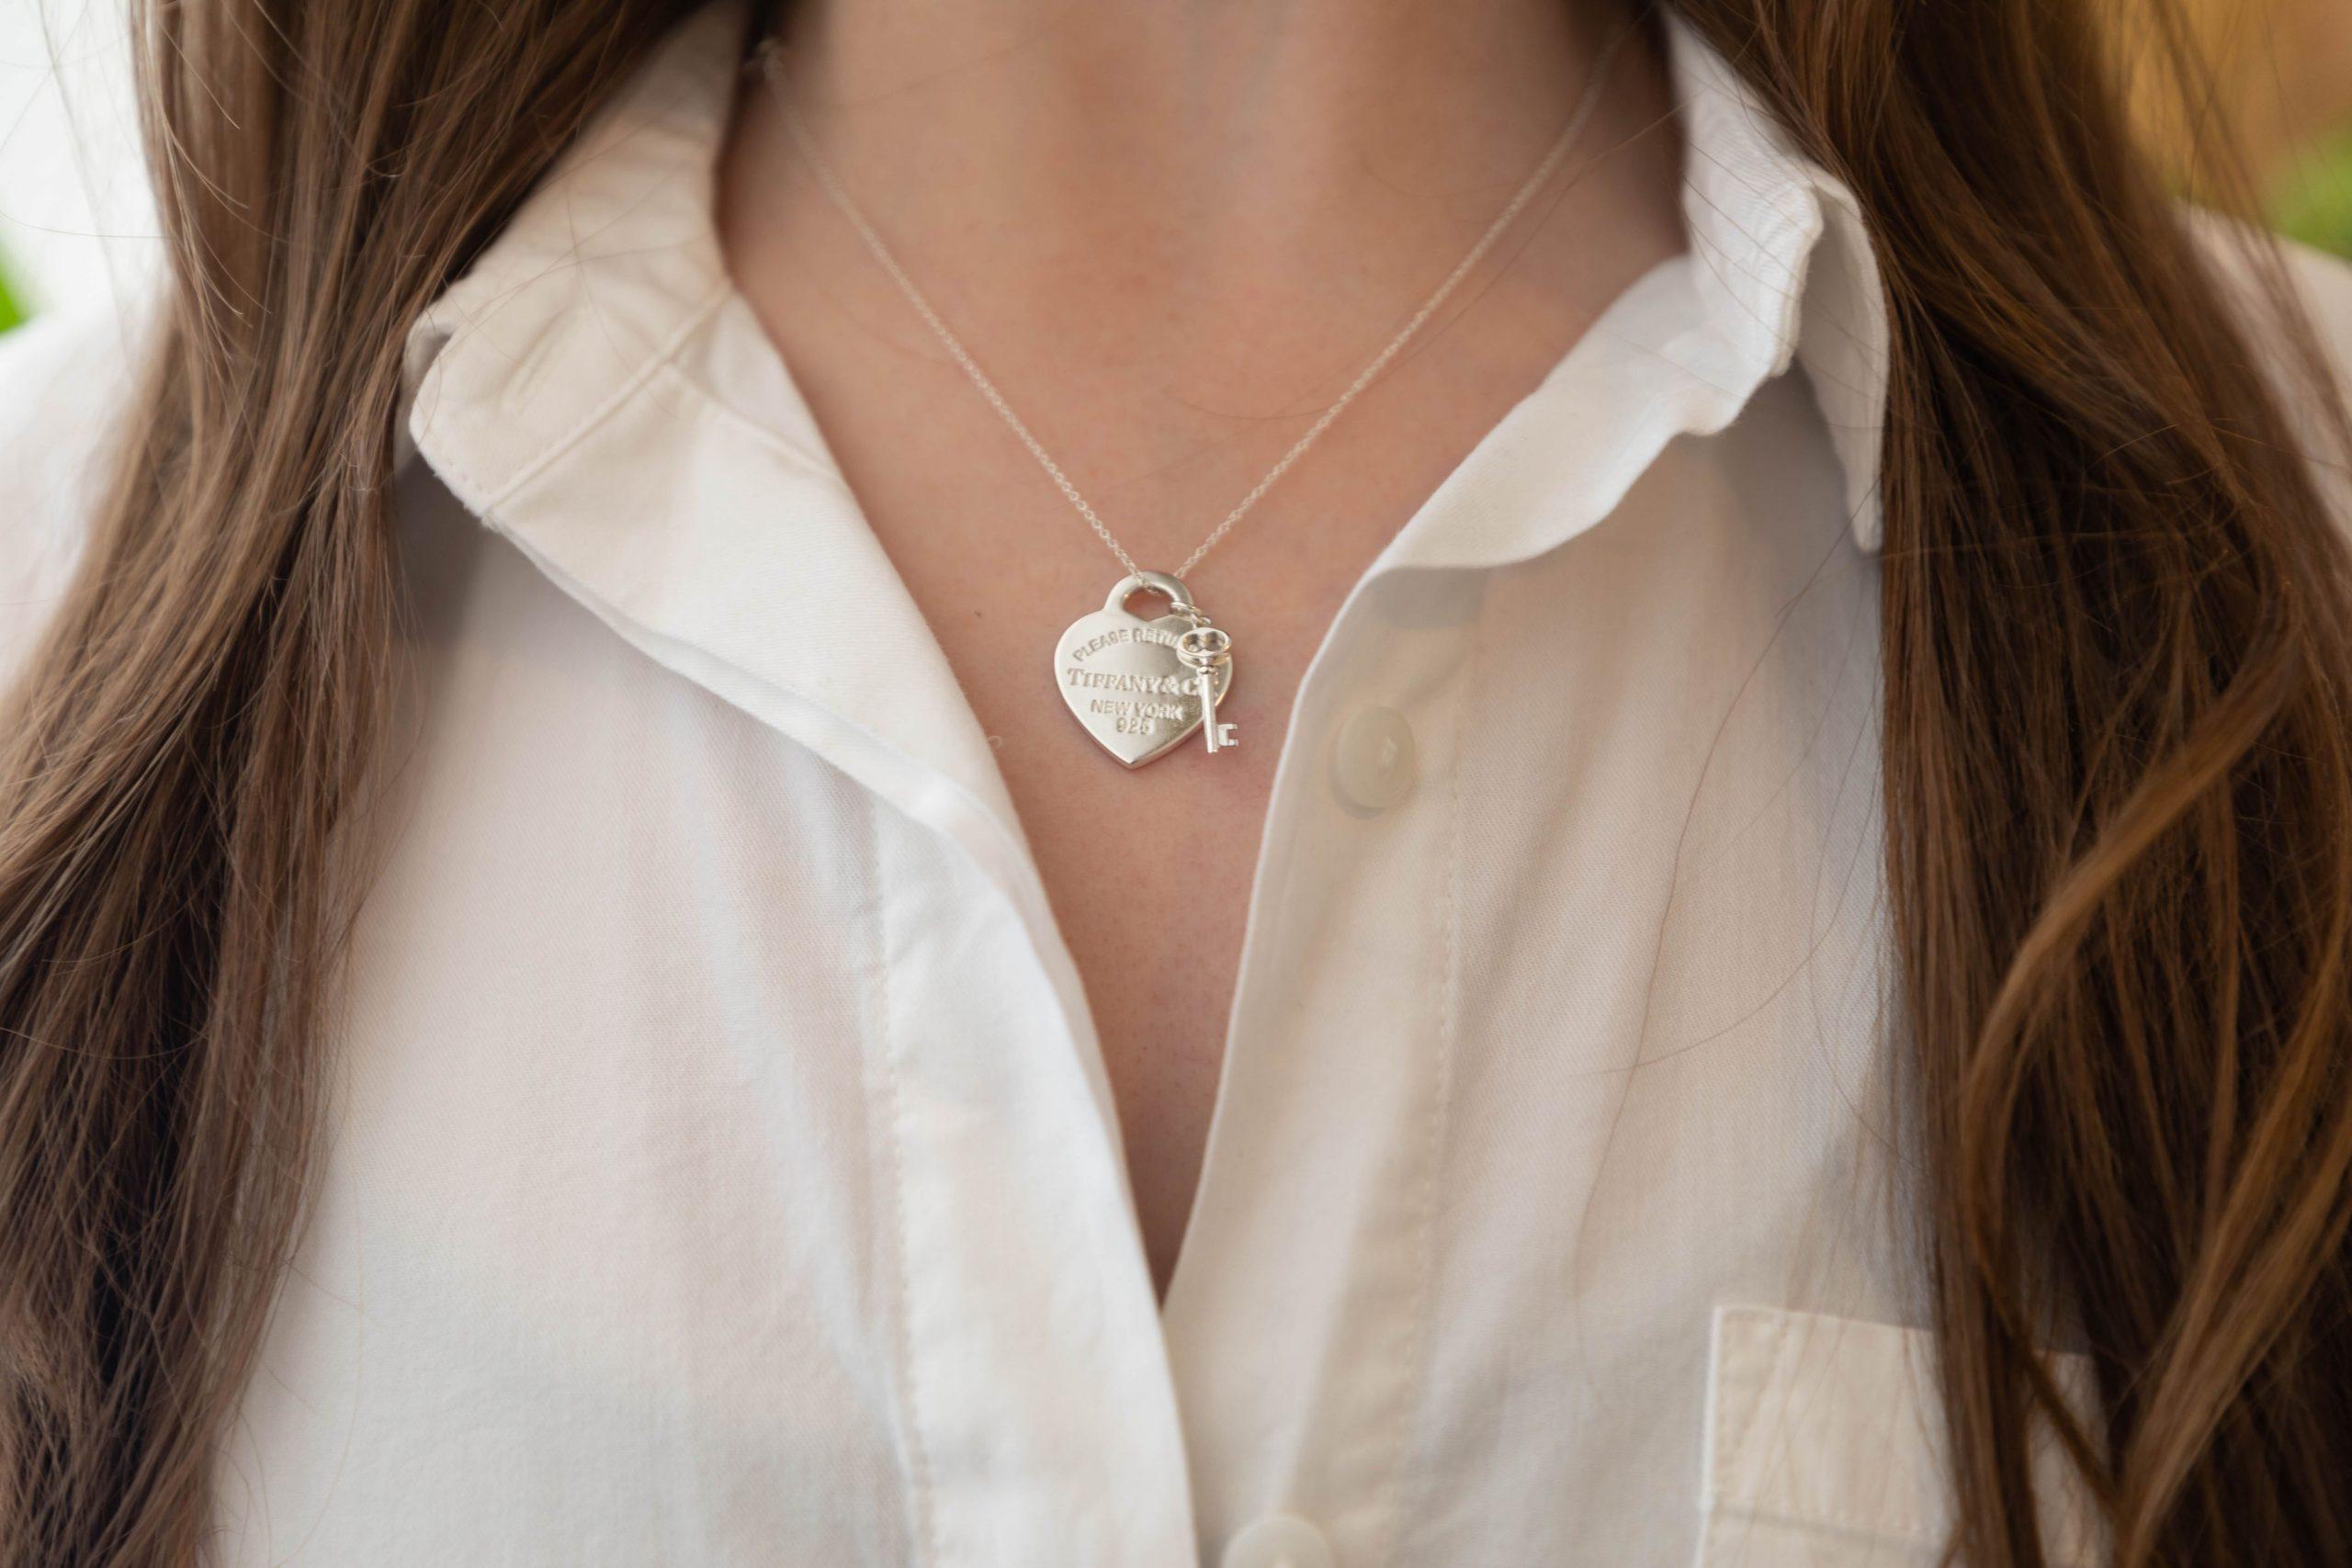 Tiffany & Co Heart Tag Necklace Worn by Annie Fairfax